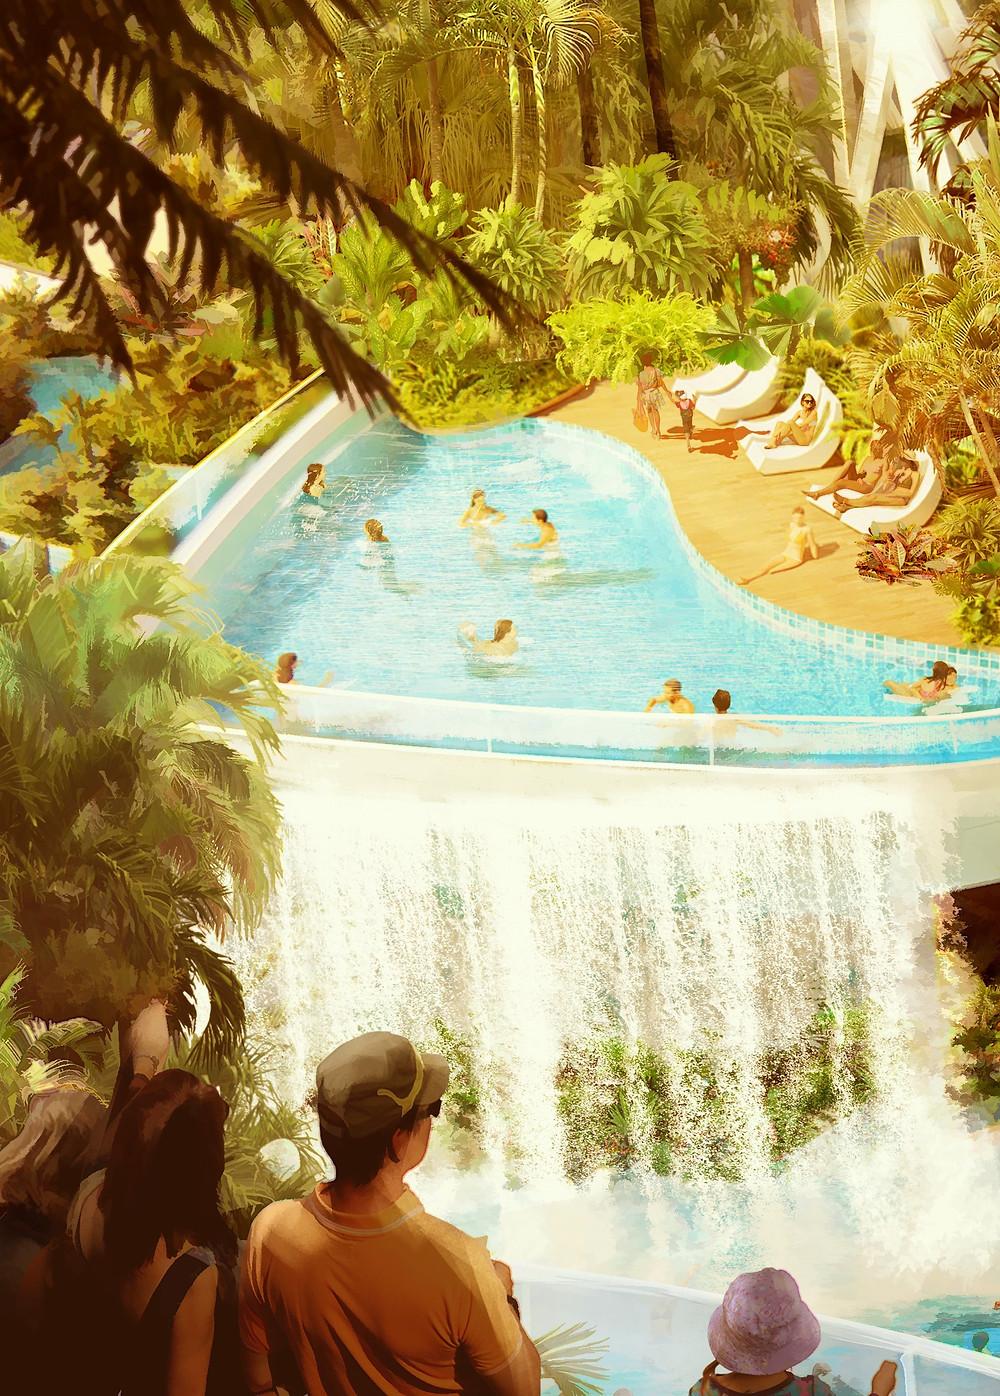 Millennial Water Attraction via FORREC